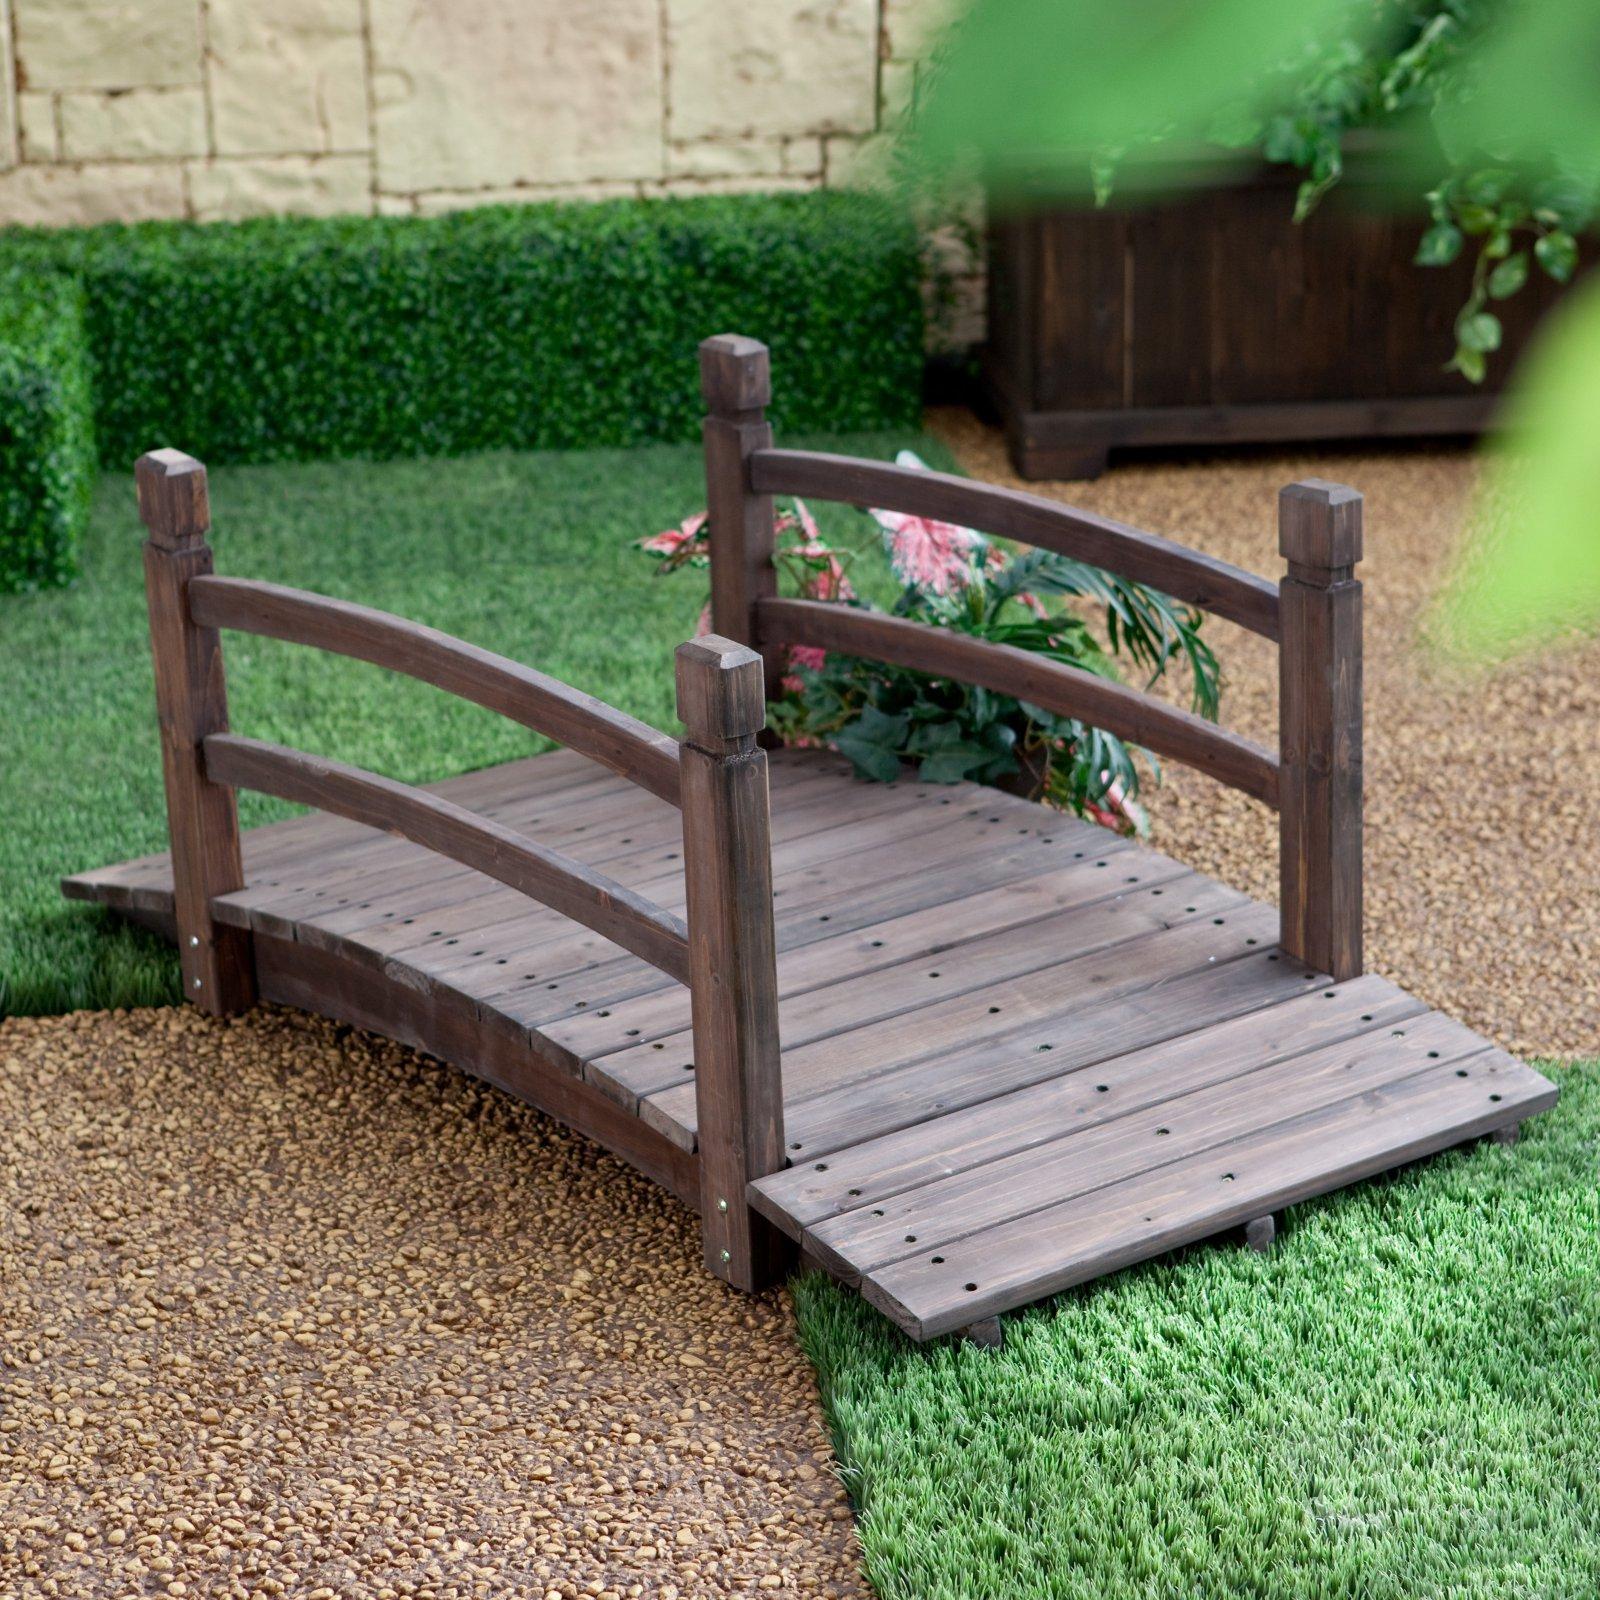 Espresso Brown Finish Wood 48'' Garden Bridge Outdoor Yard Lawn Landscaping Decor